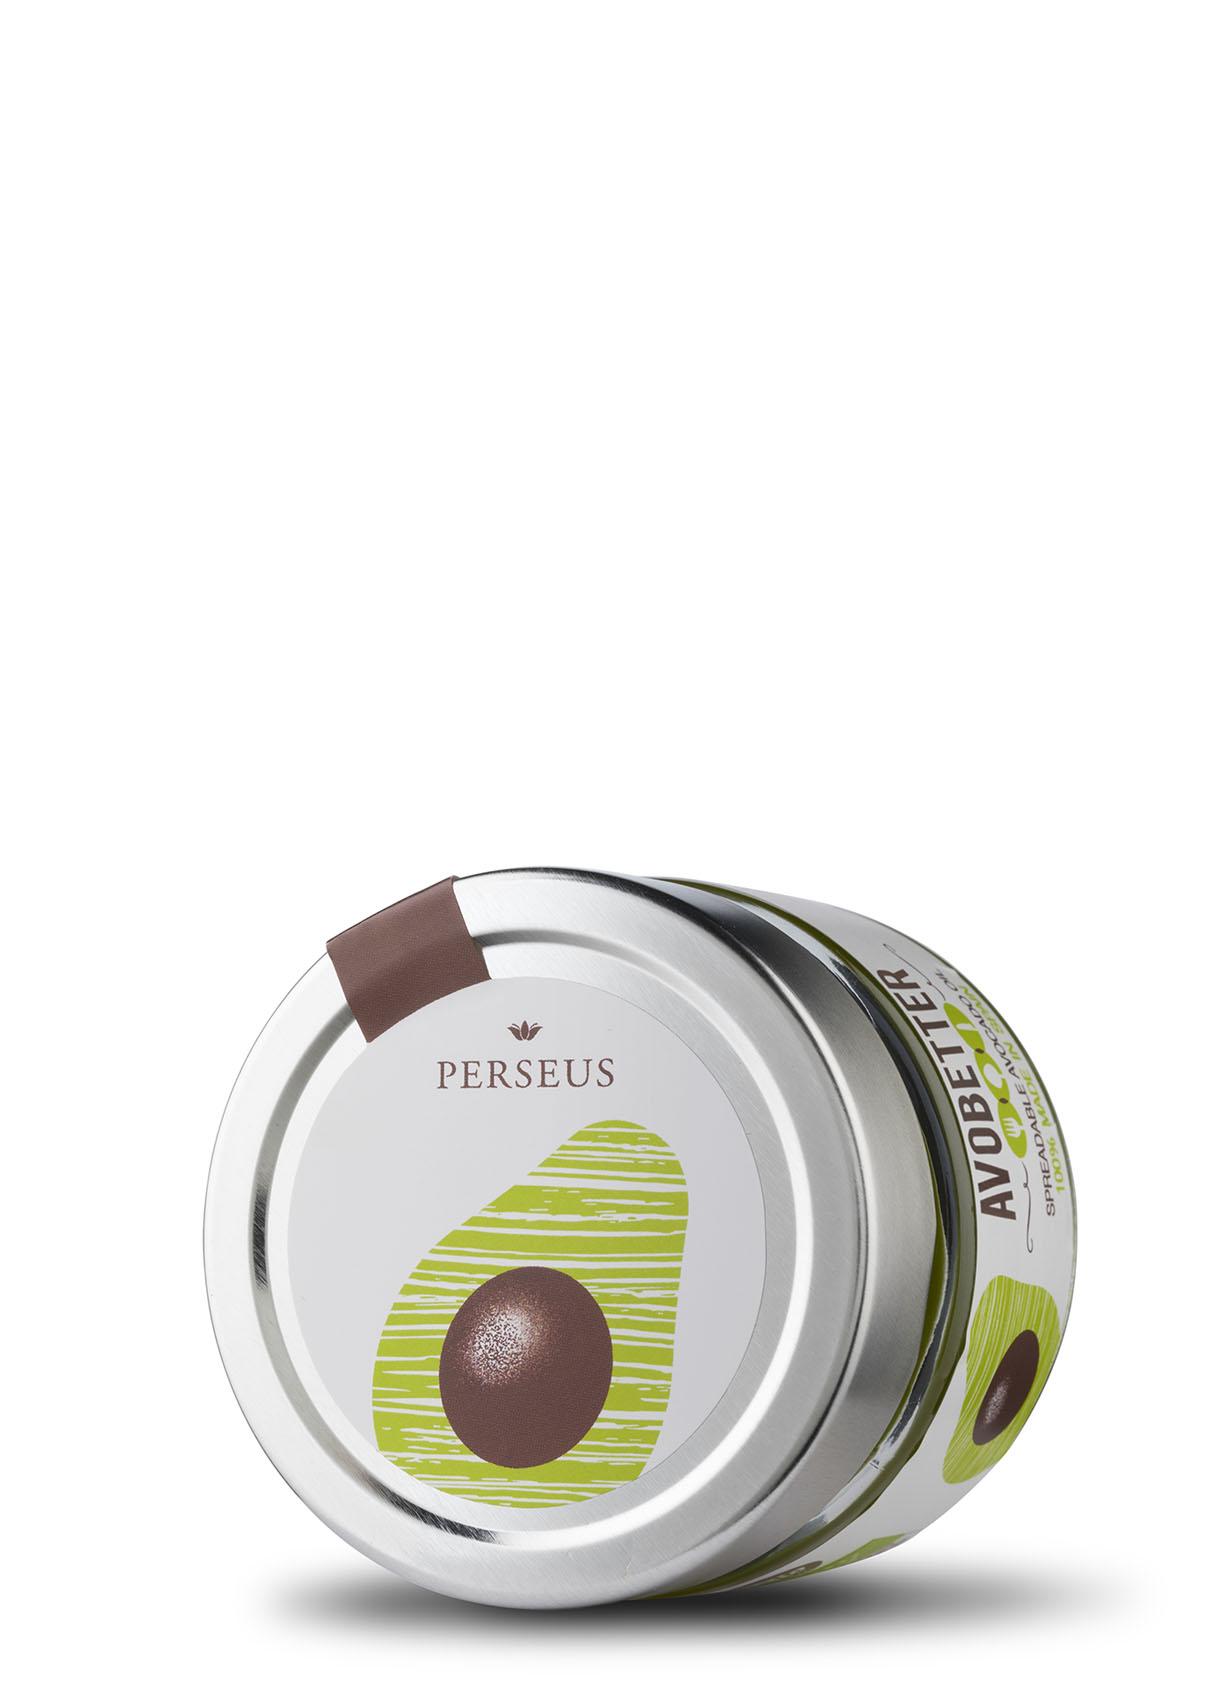 avobetter-perseus-producto